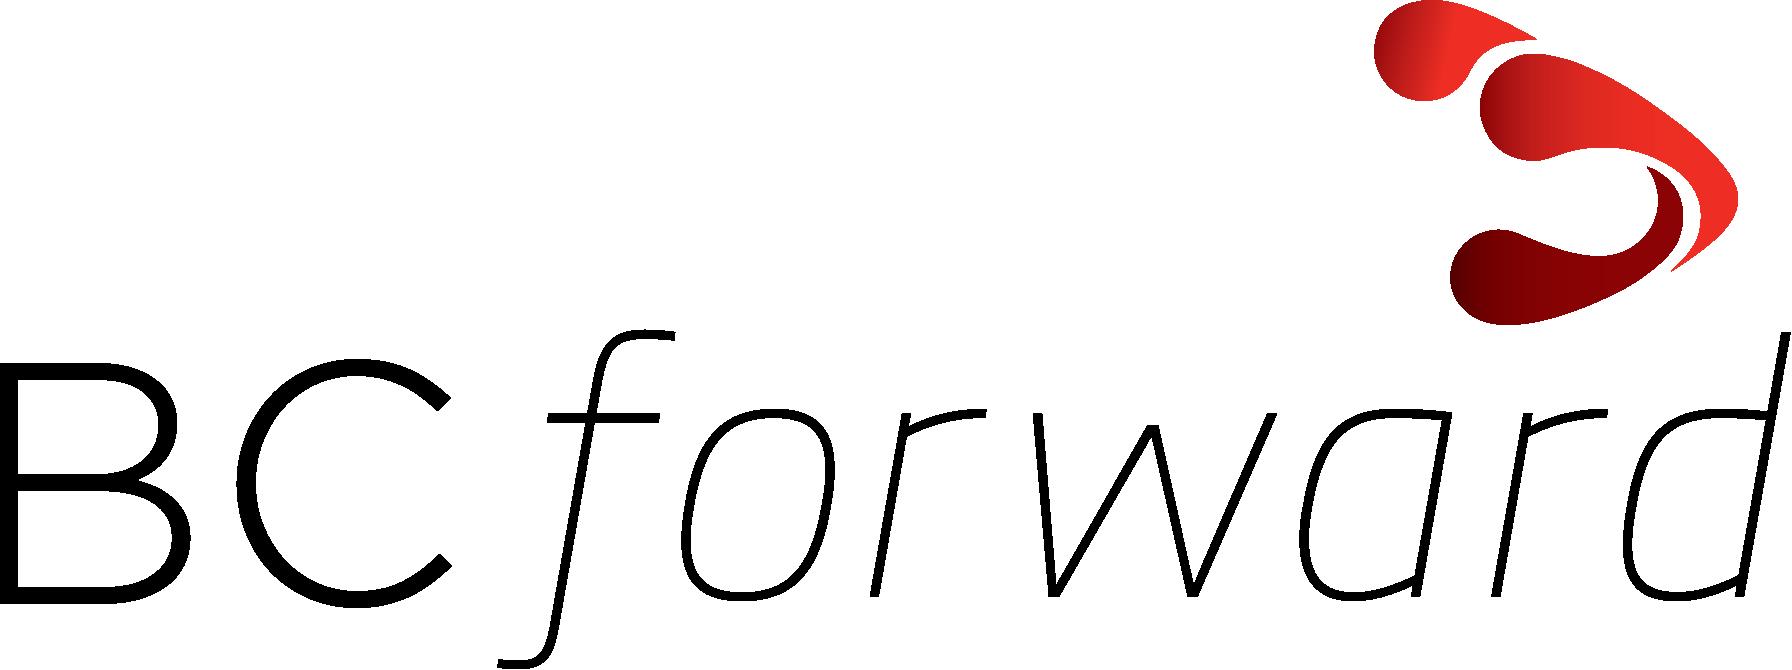 BCforward's logo